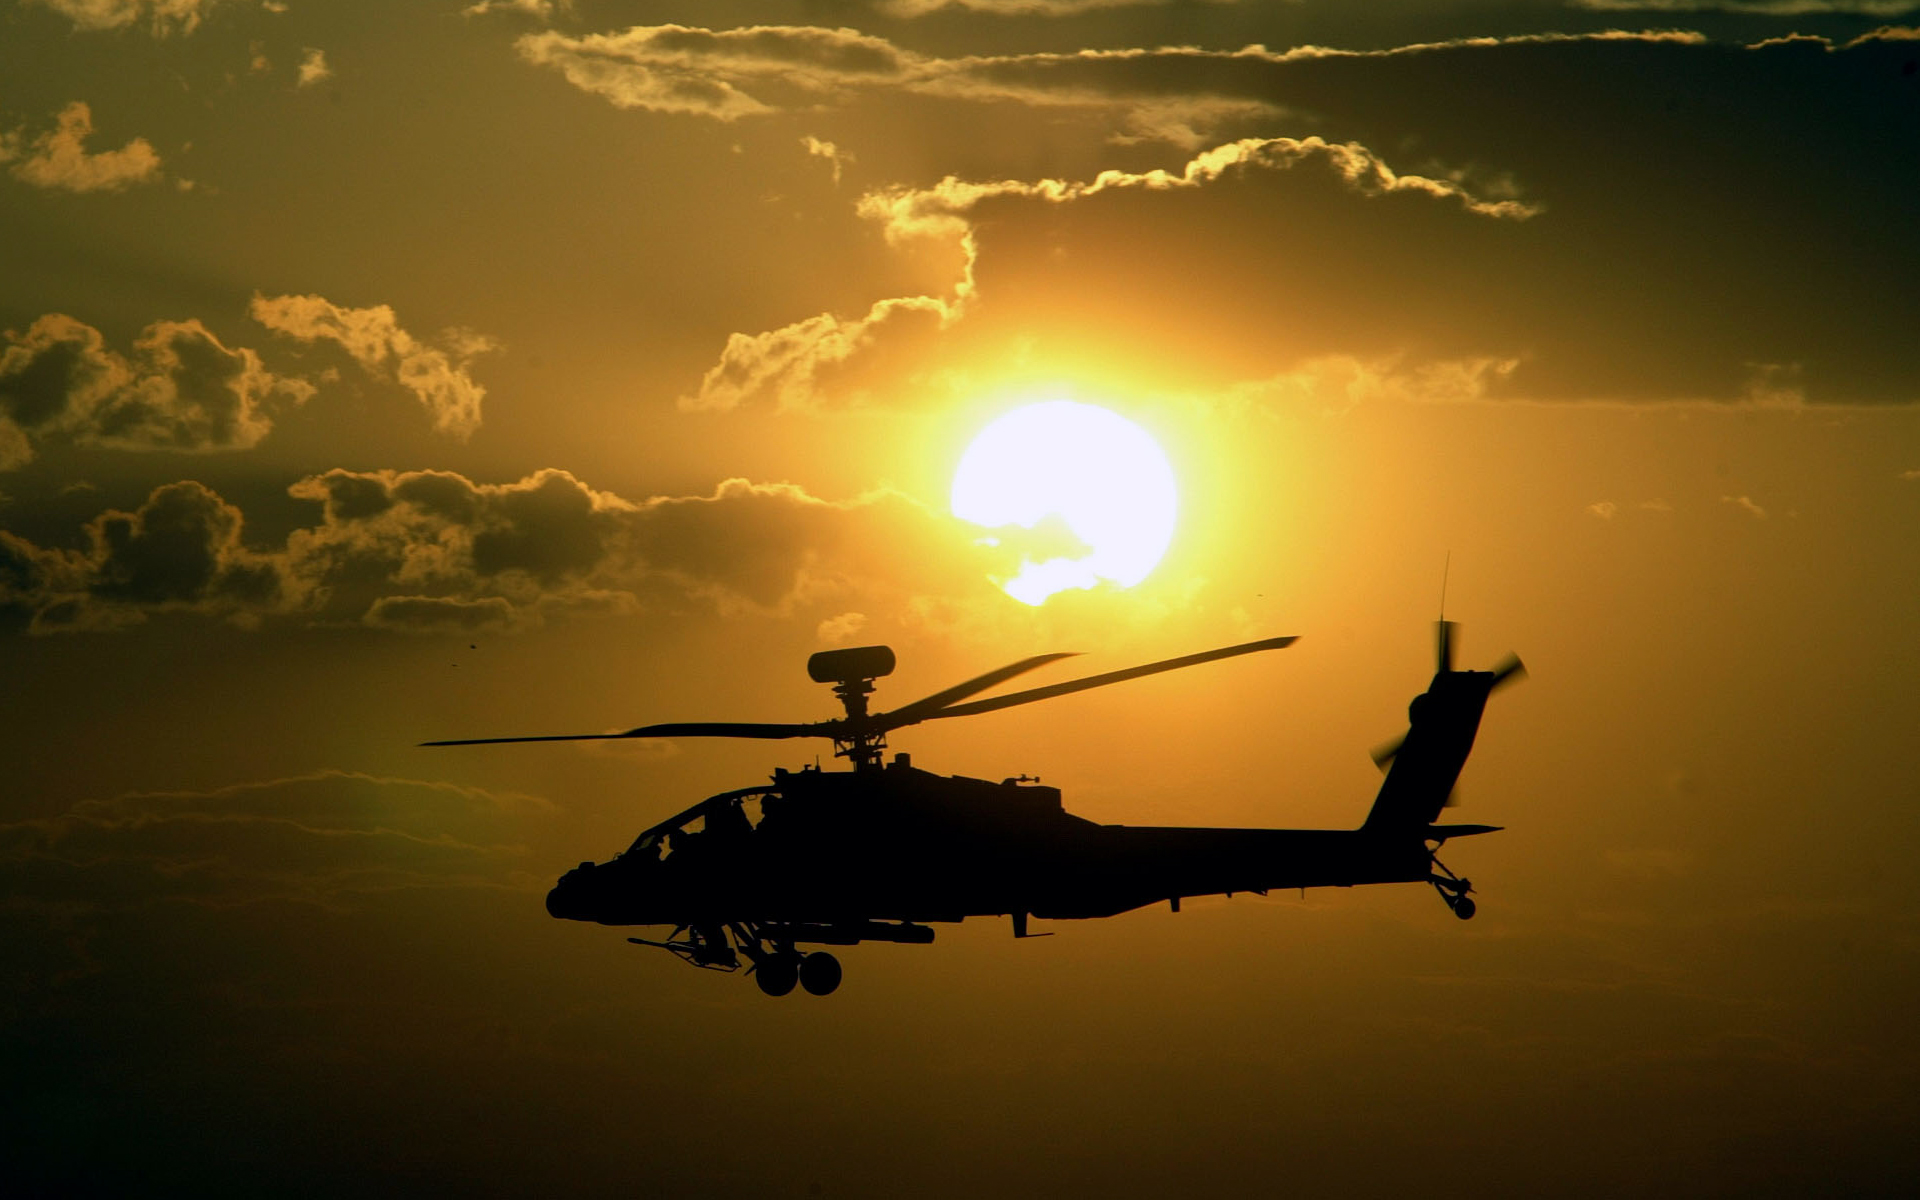 Helicóptero AH 64 Apache - 1920x1200